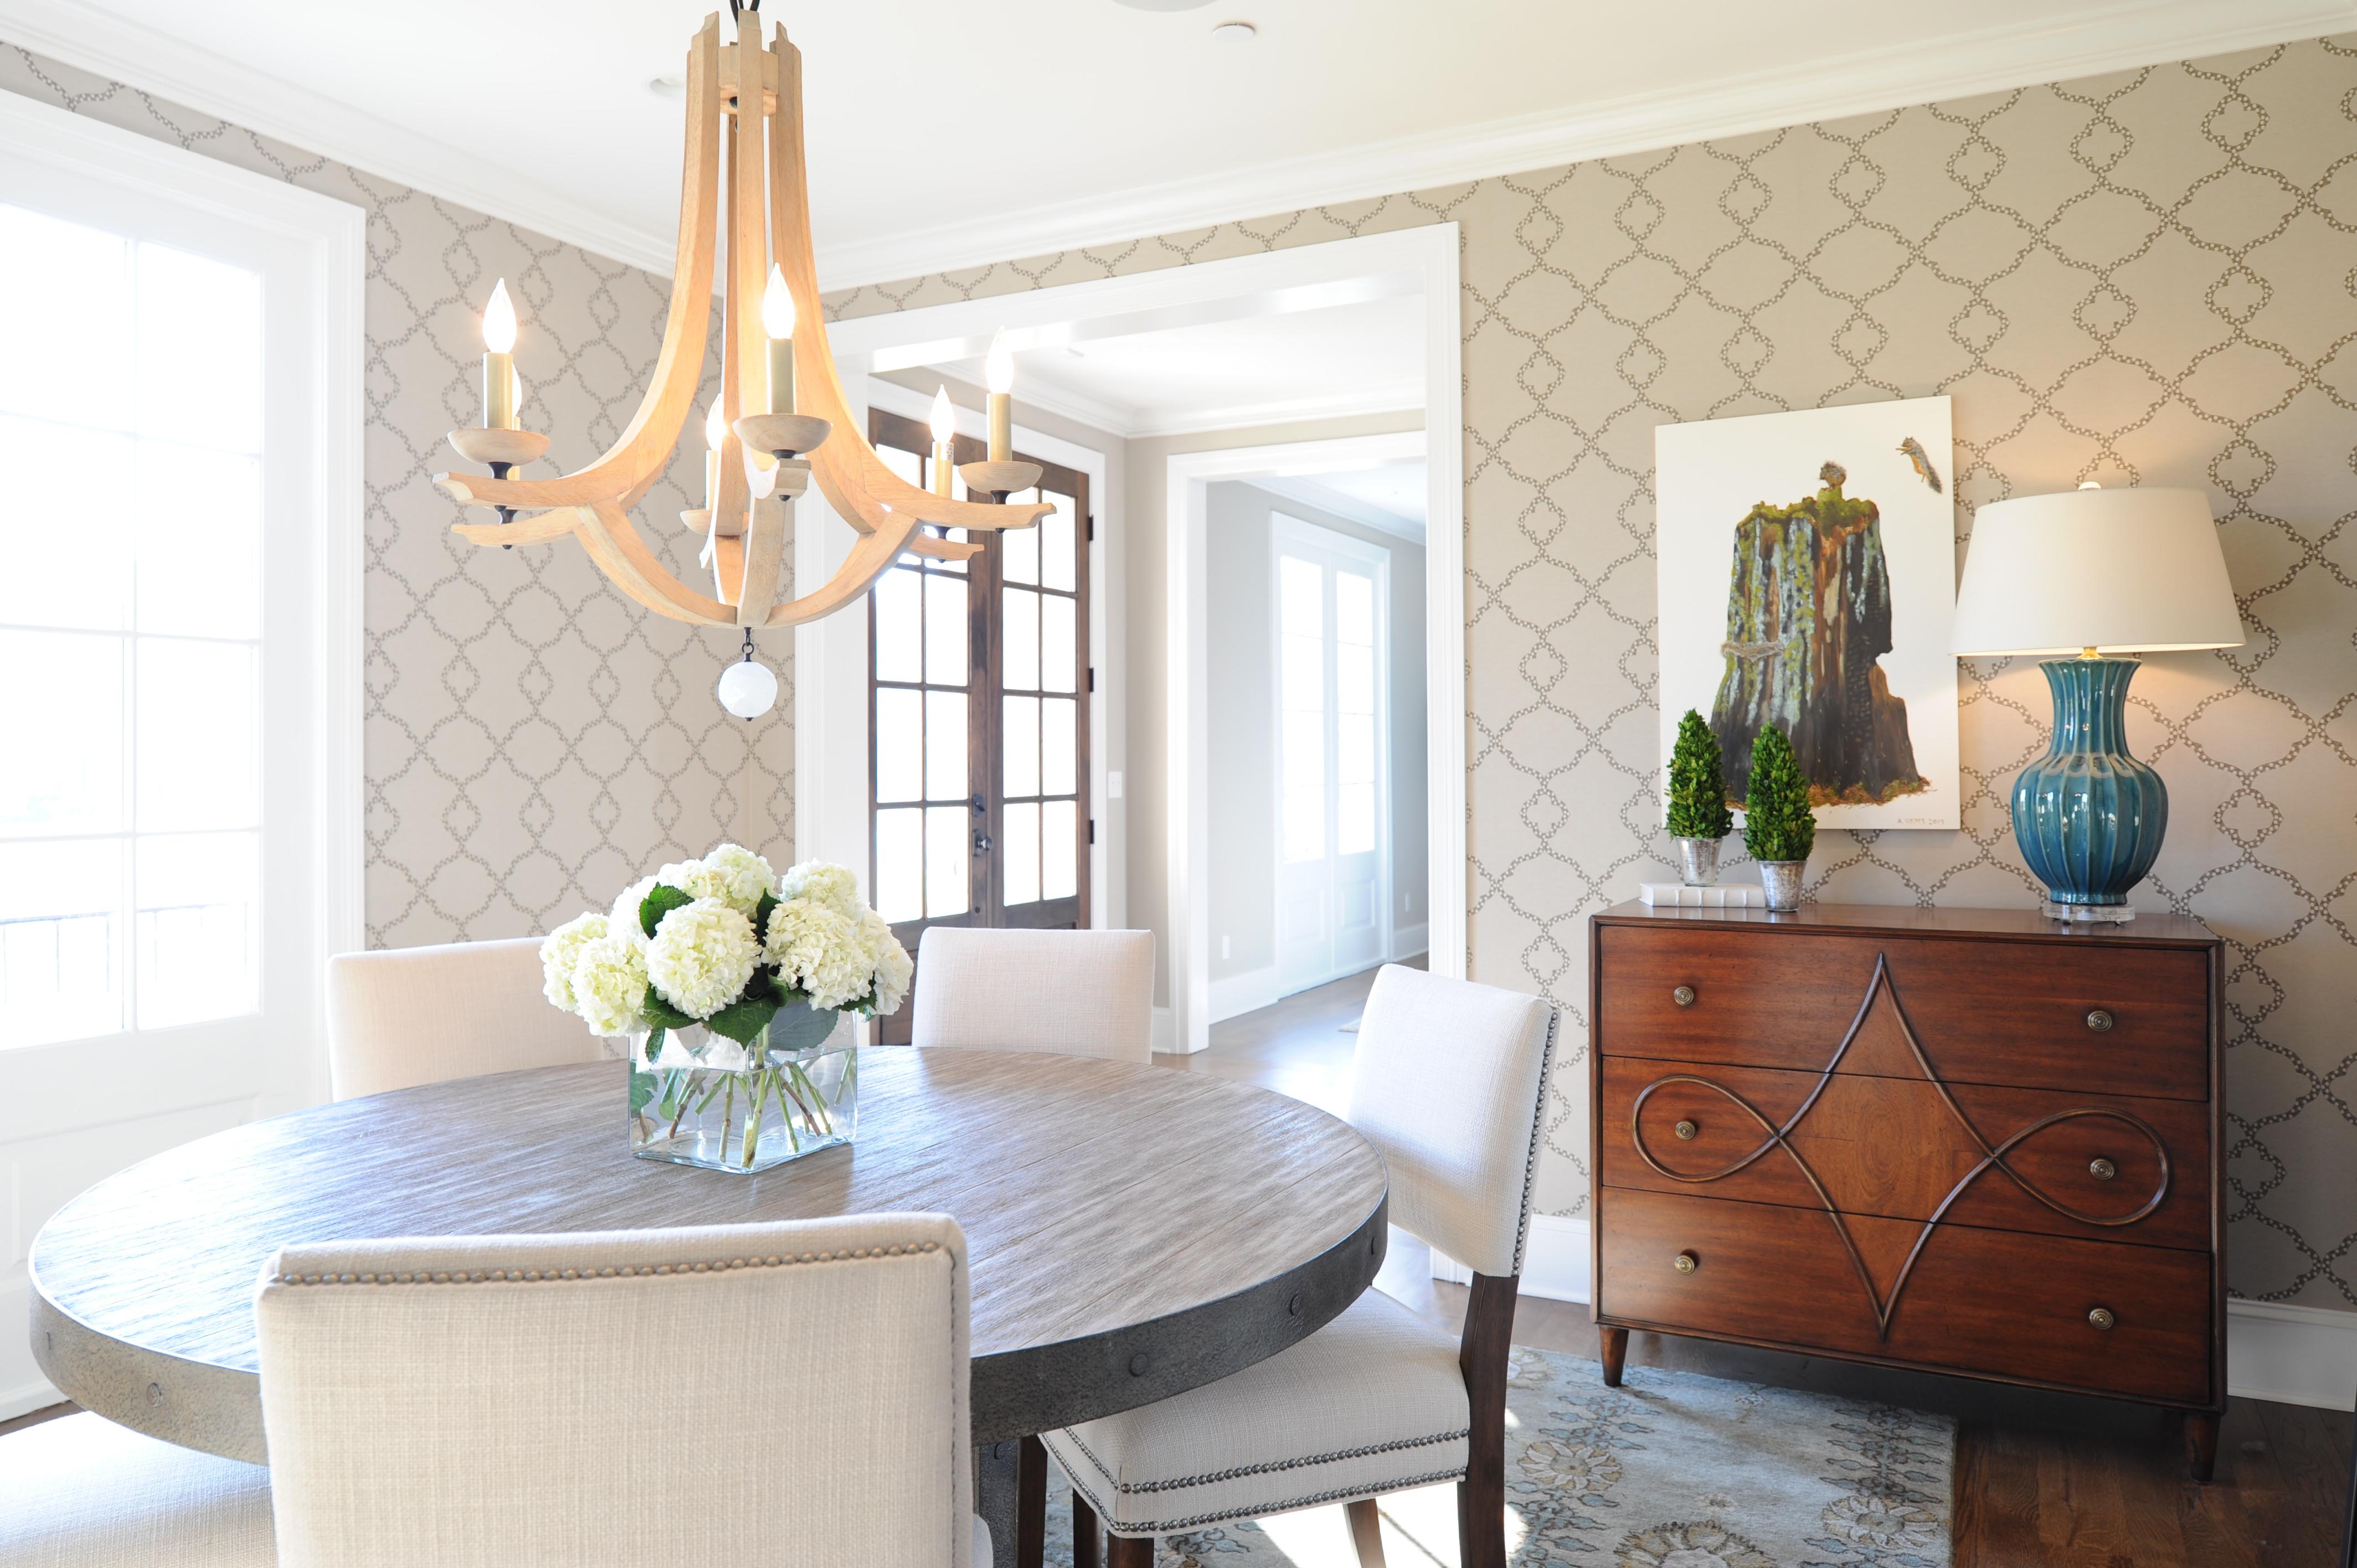 Vesta home show 2014 chestnut hall for Classic home designs collierville tn